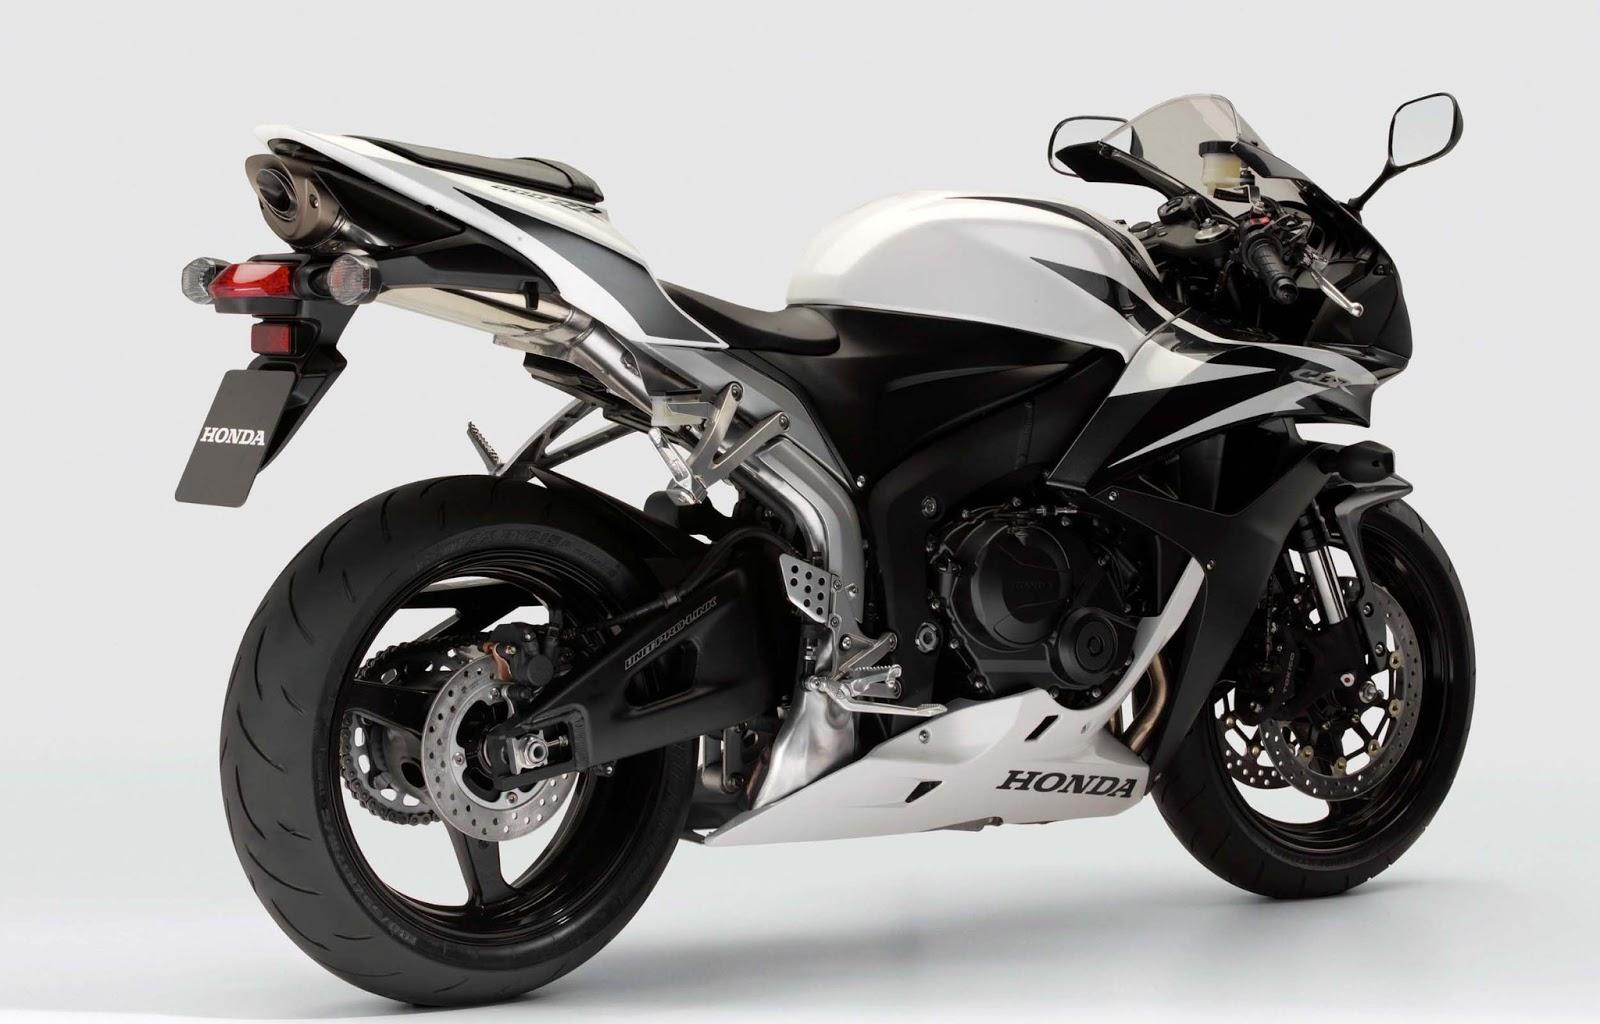 Honda cbr 2014 sports super sports bike photo - Honda Cbr 600rr Hd Wallpapers